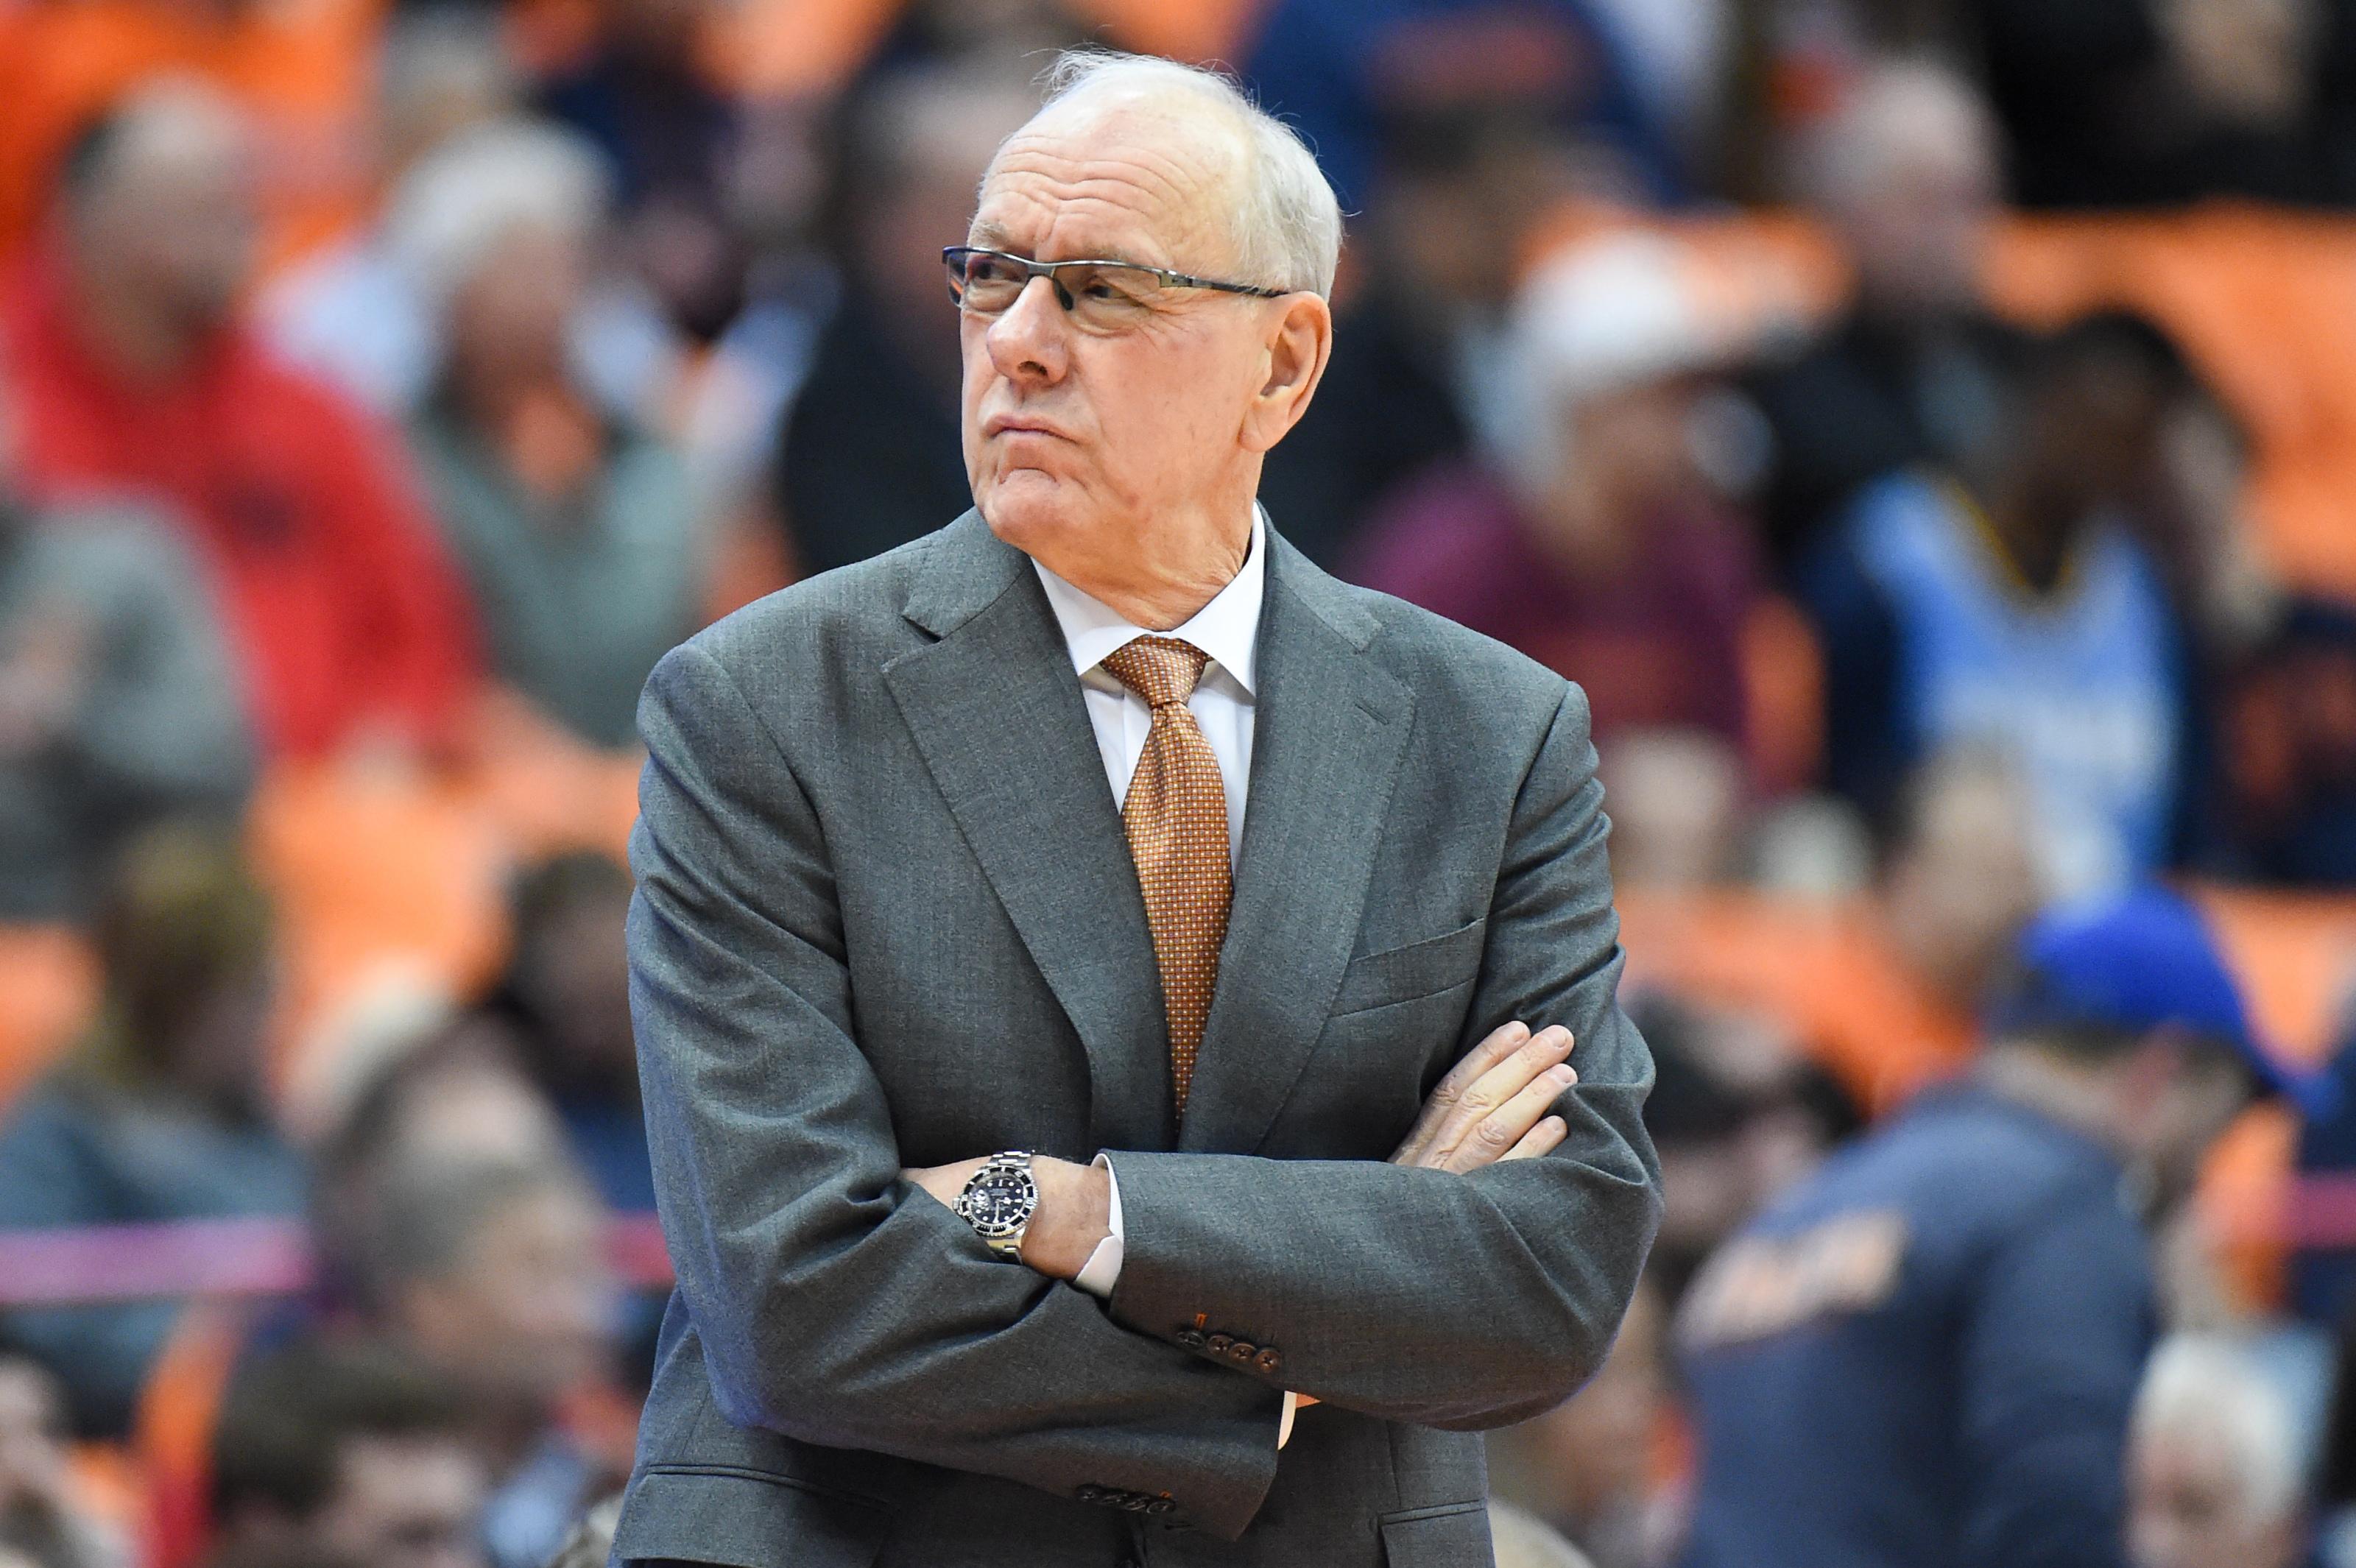 Texas Basketball: Jim Boeheim thinks Kevin Durant could've chosen Syracuse